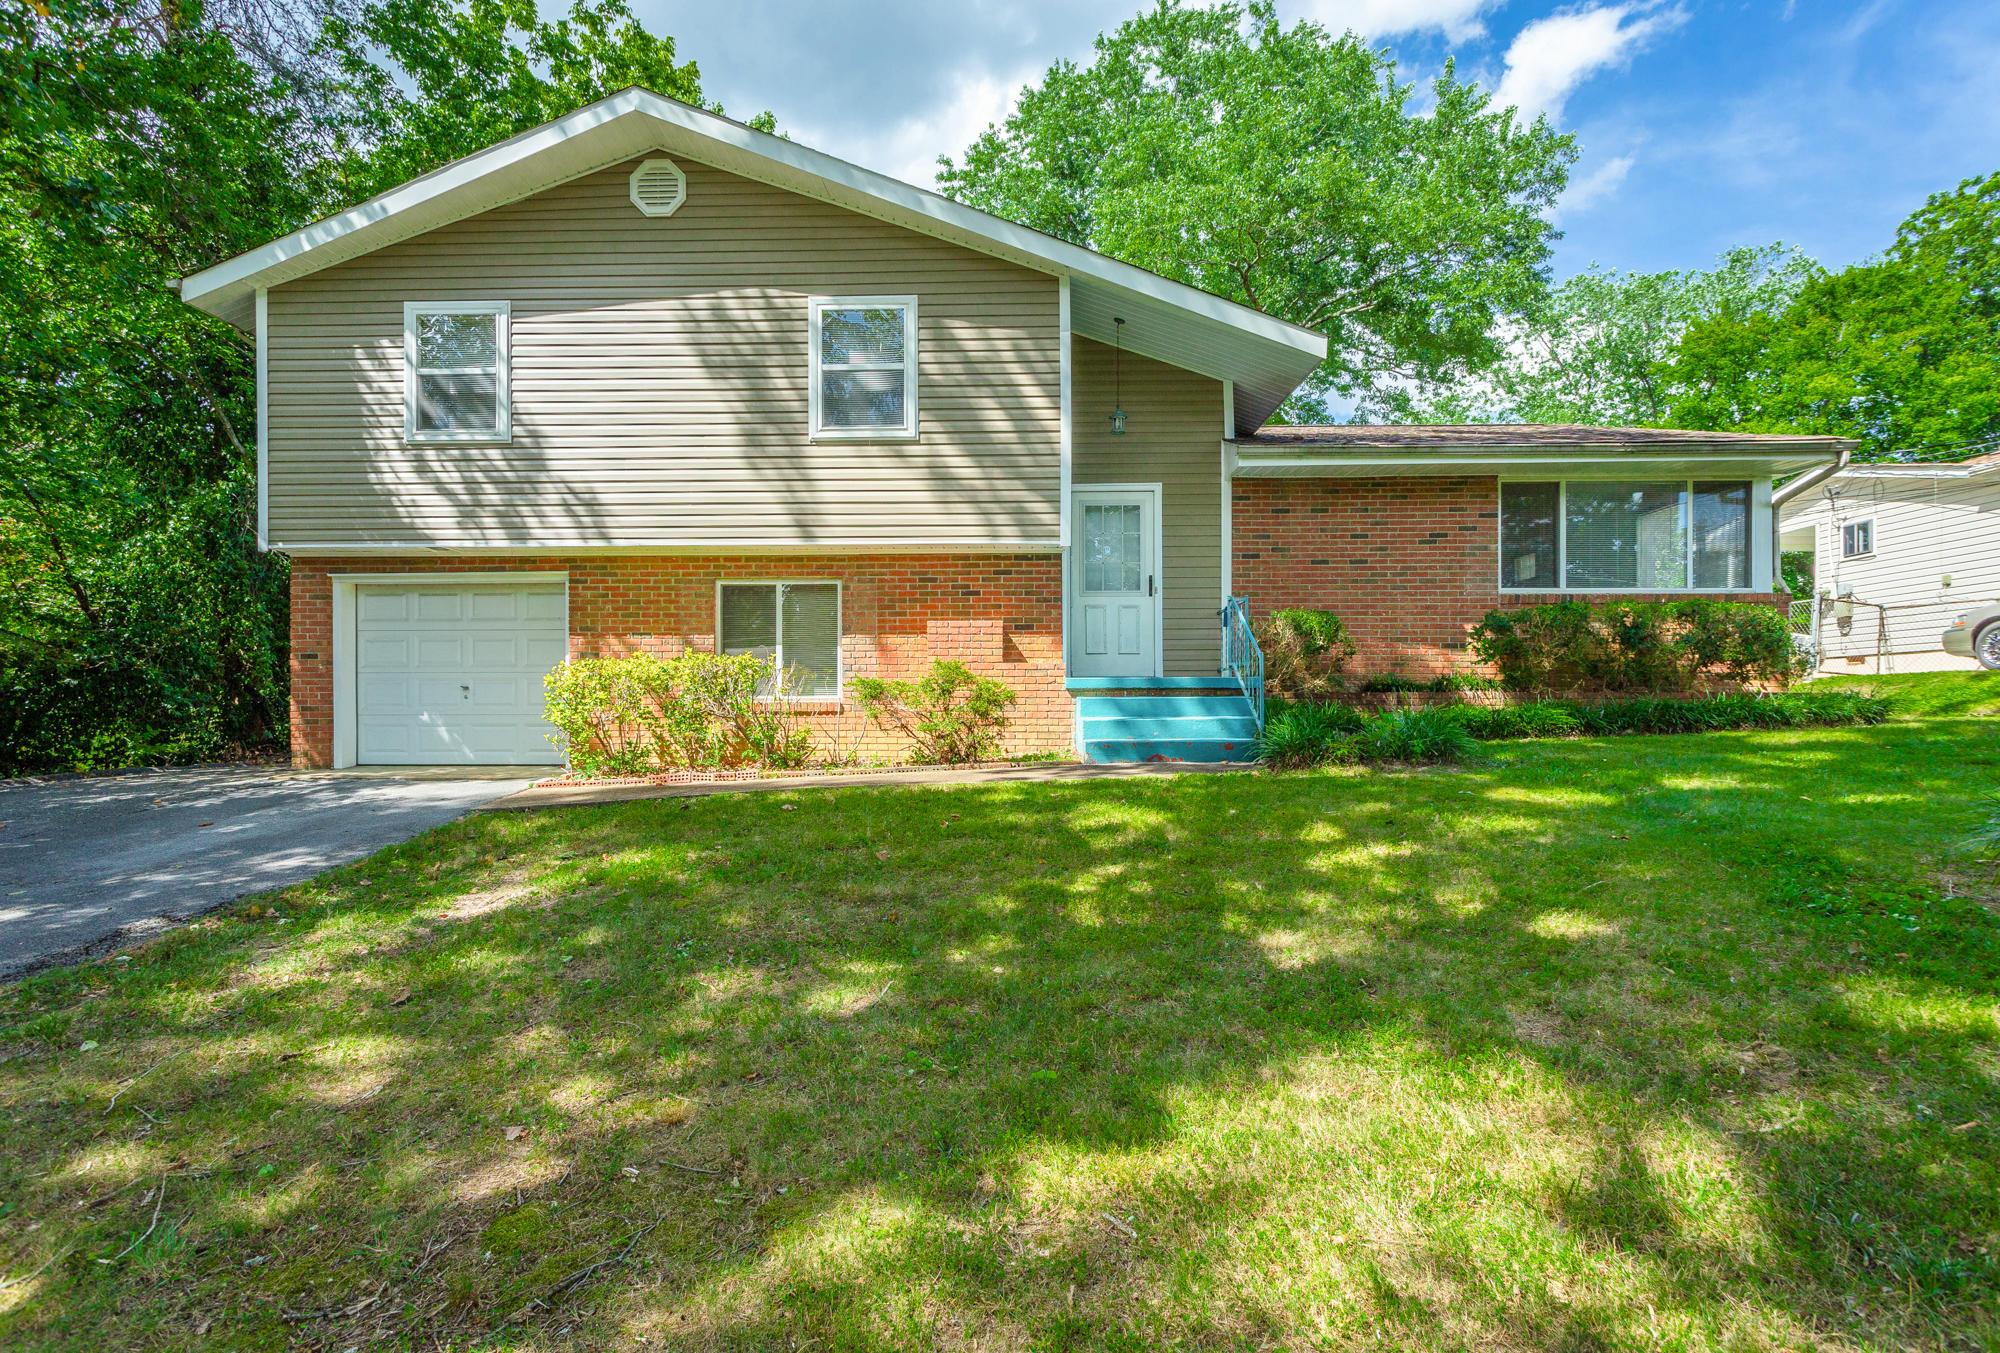 511 Appian Way, Chattanooga, TN 37415